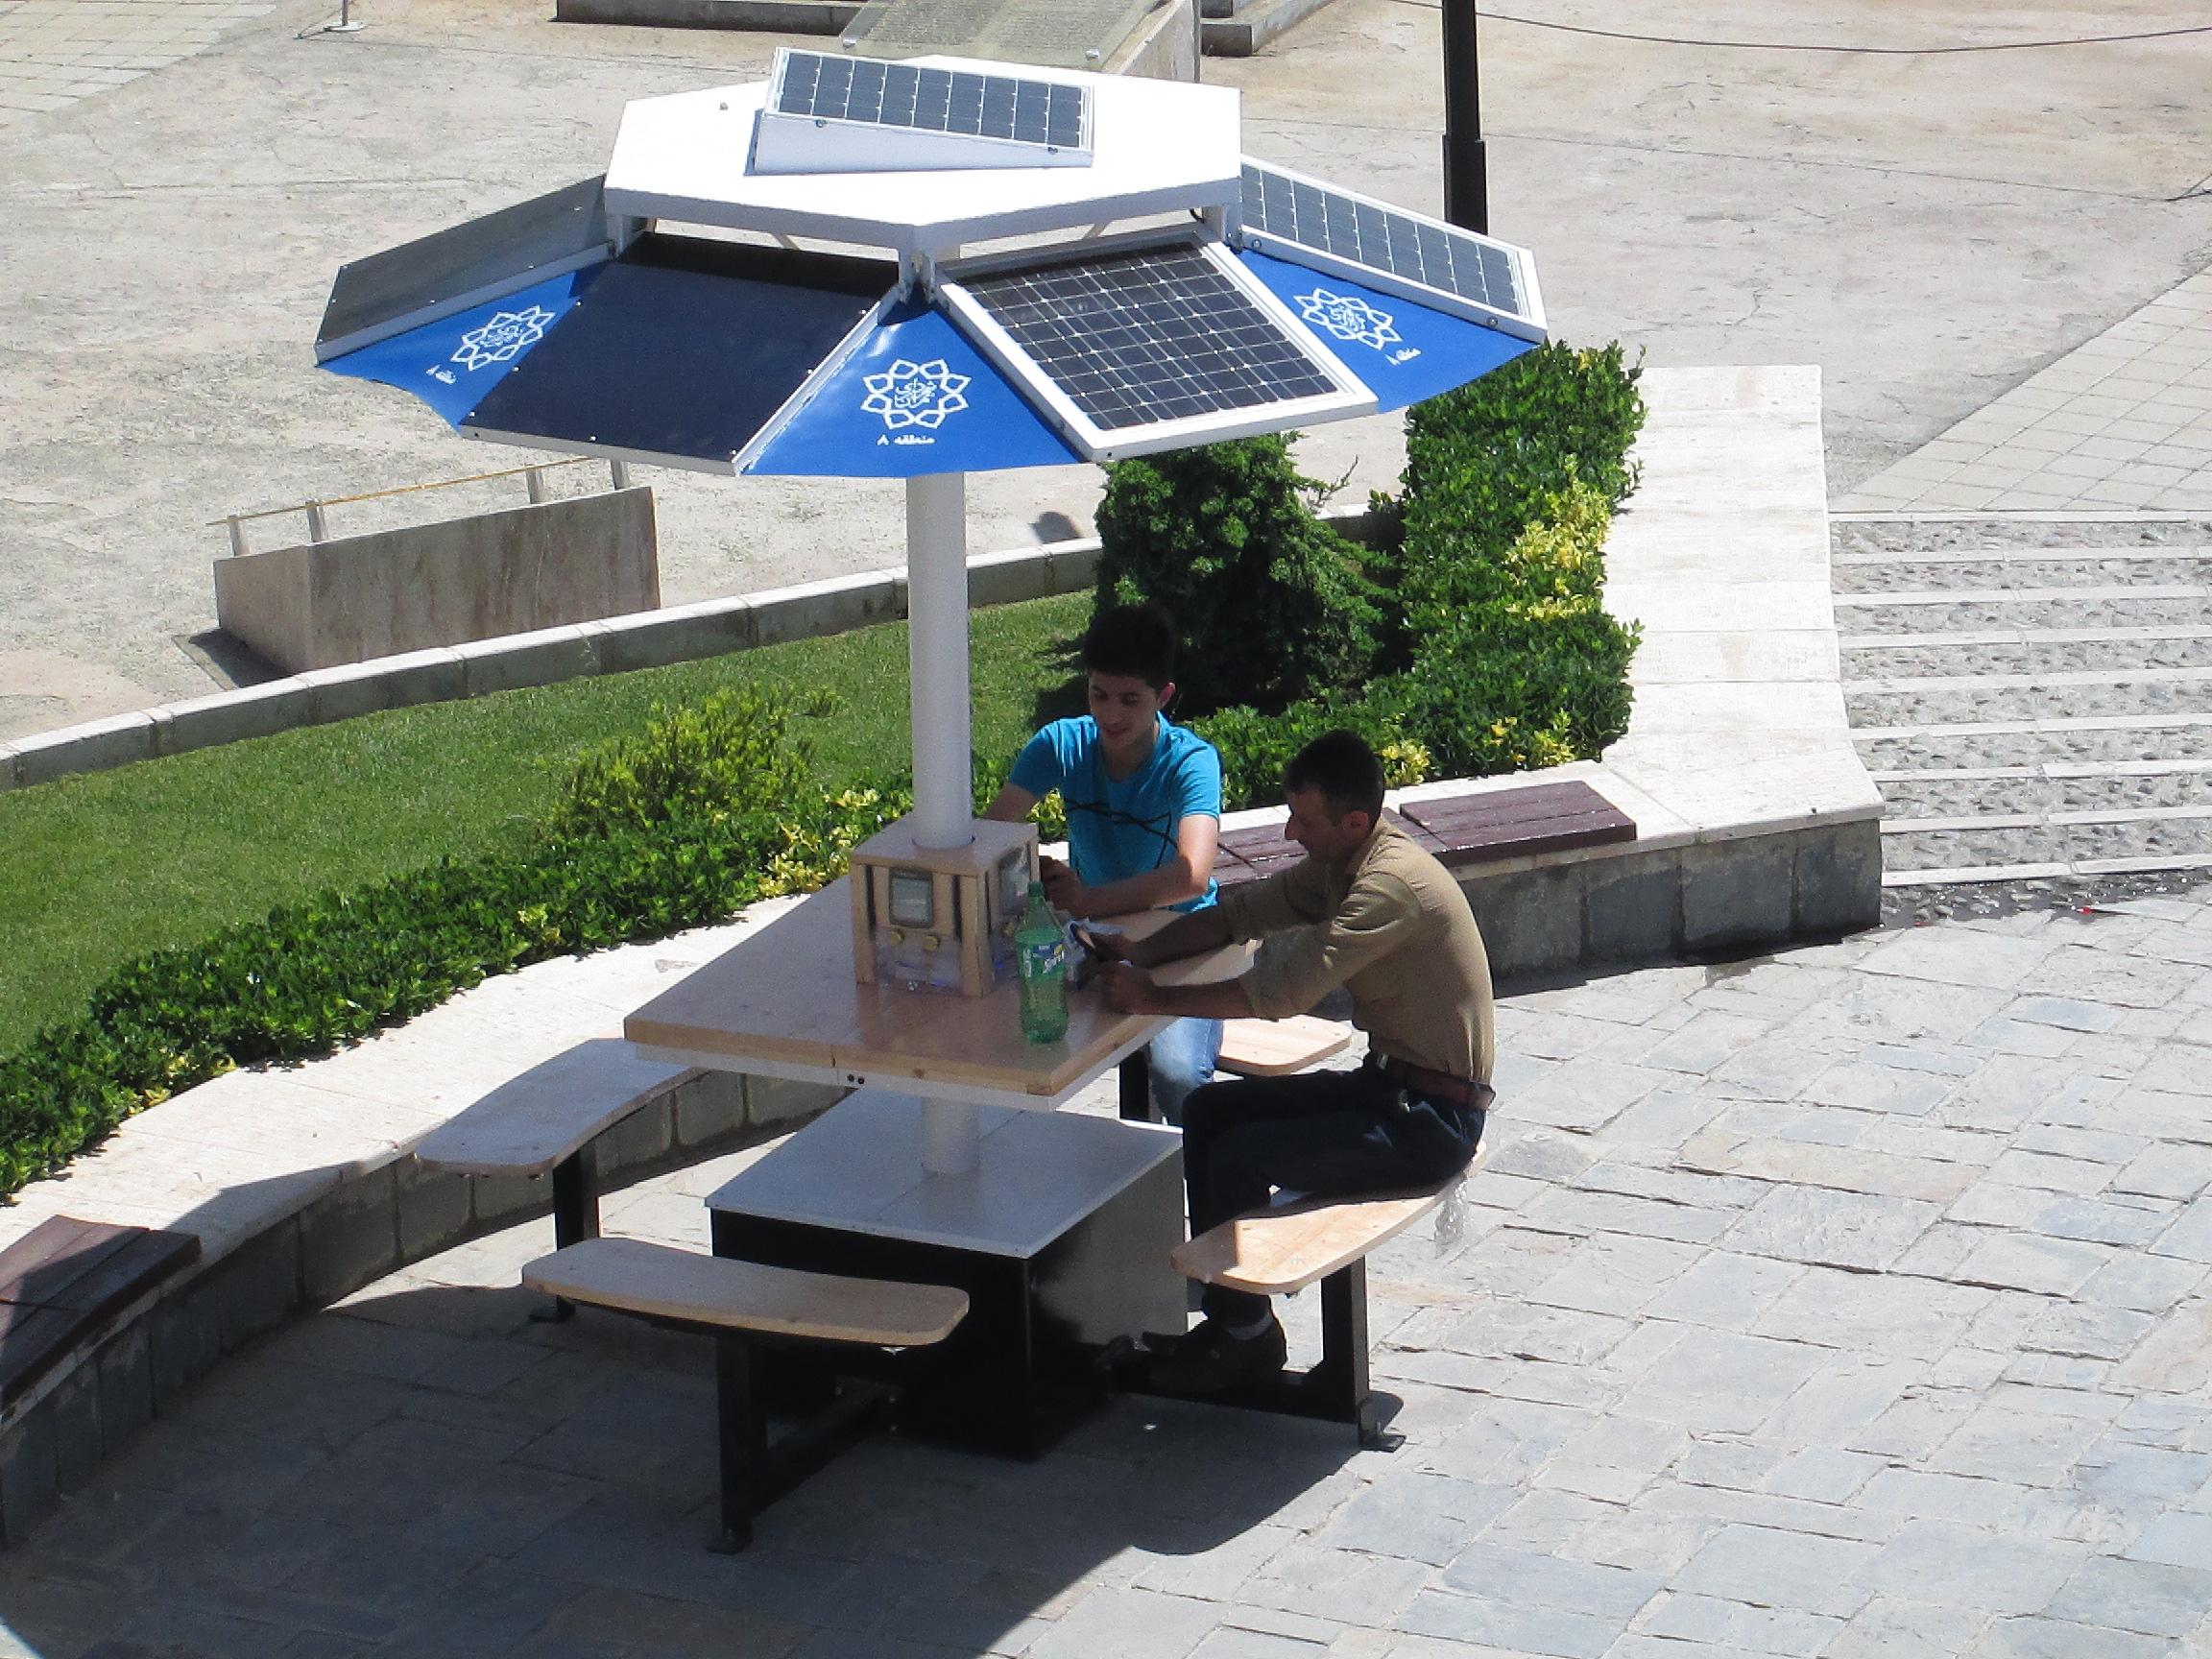 انرژی خورشیدی، ، برق خورشیدی خانگی، پنل خورشیدی مبلمان شهری، مبلمان مدرن، شهر هوشمند، فضاسازی ویلا، محوطه ویلا، فضای سبز